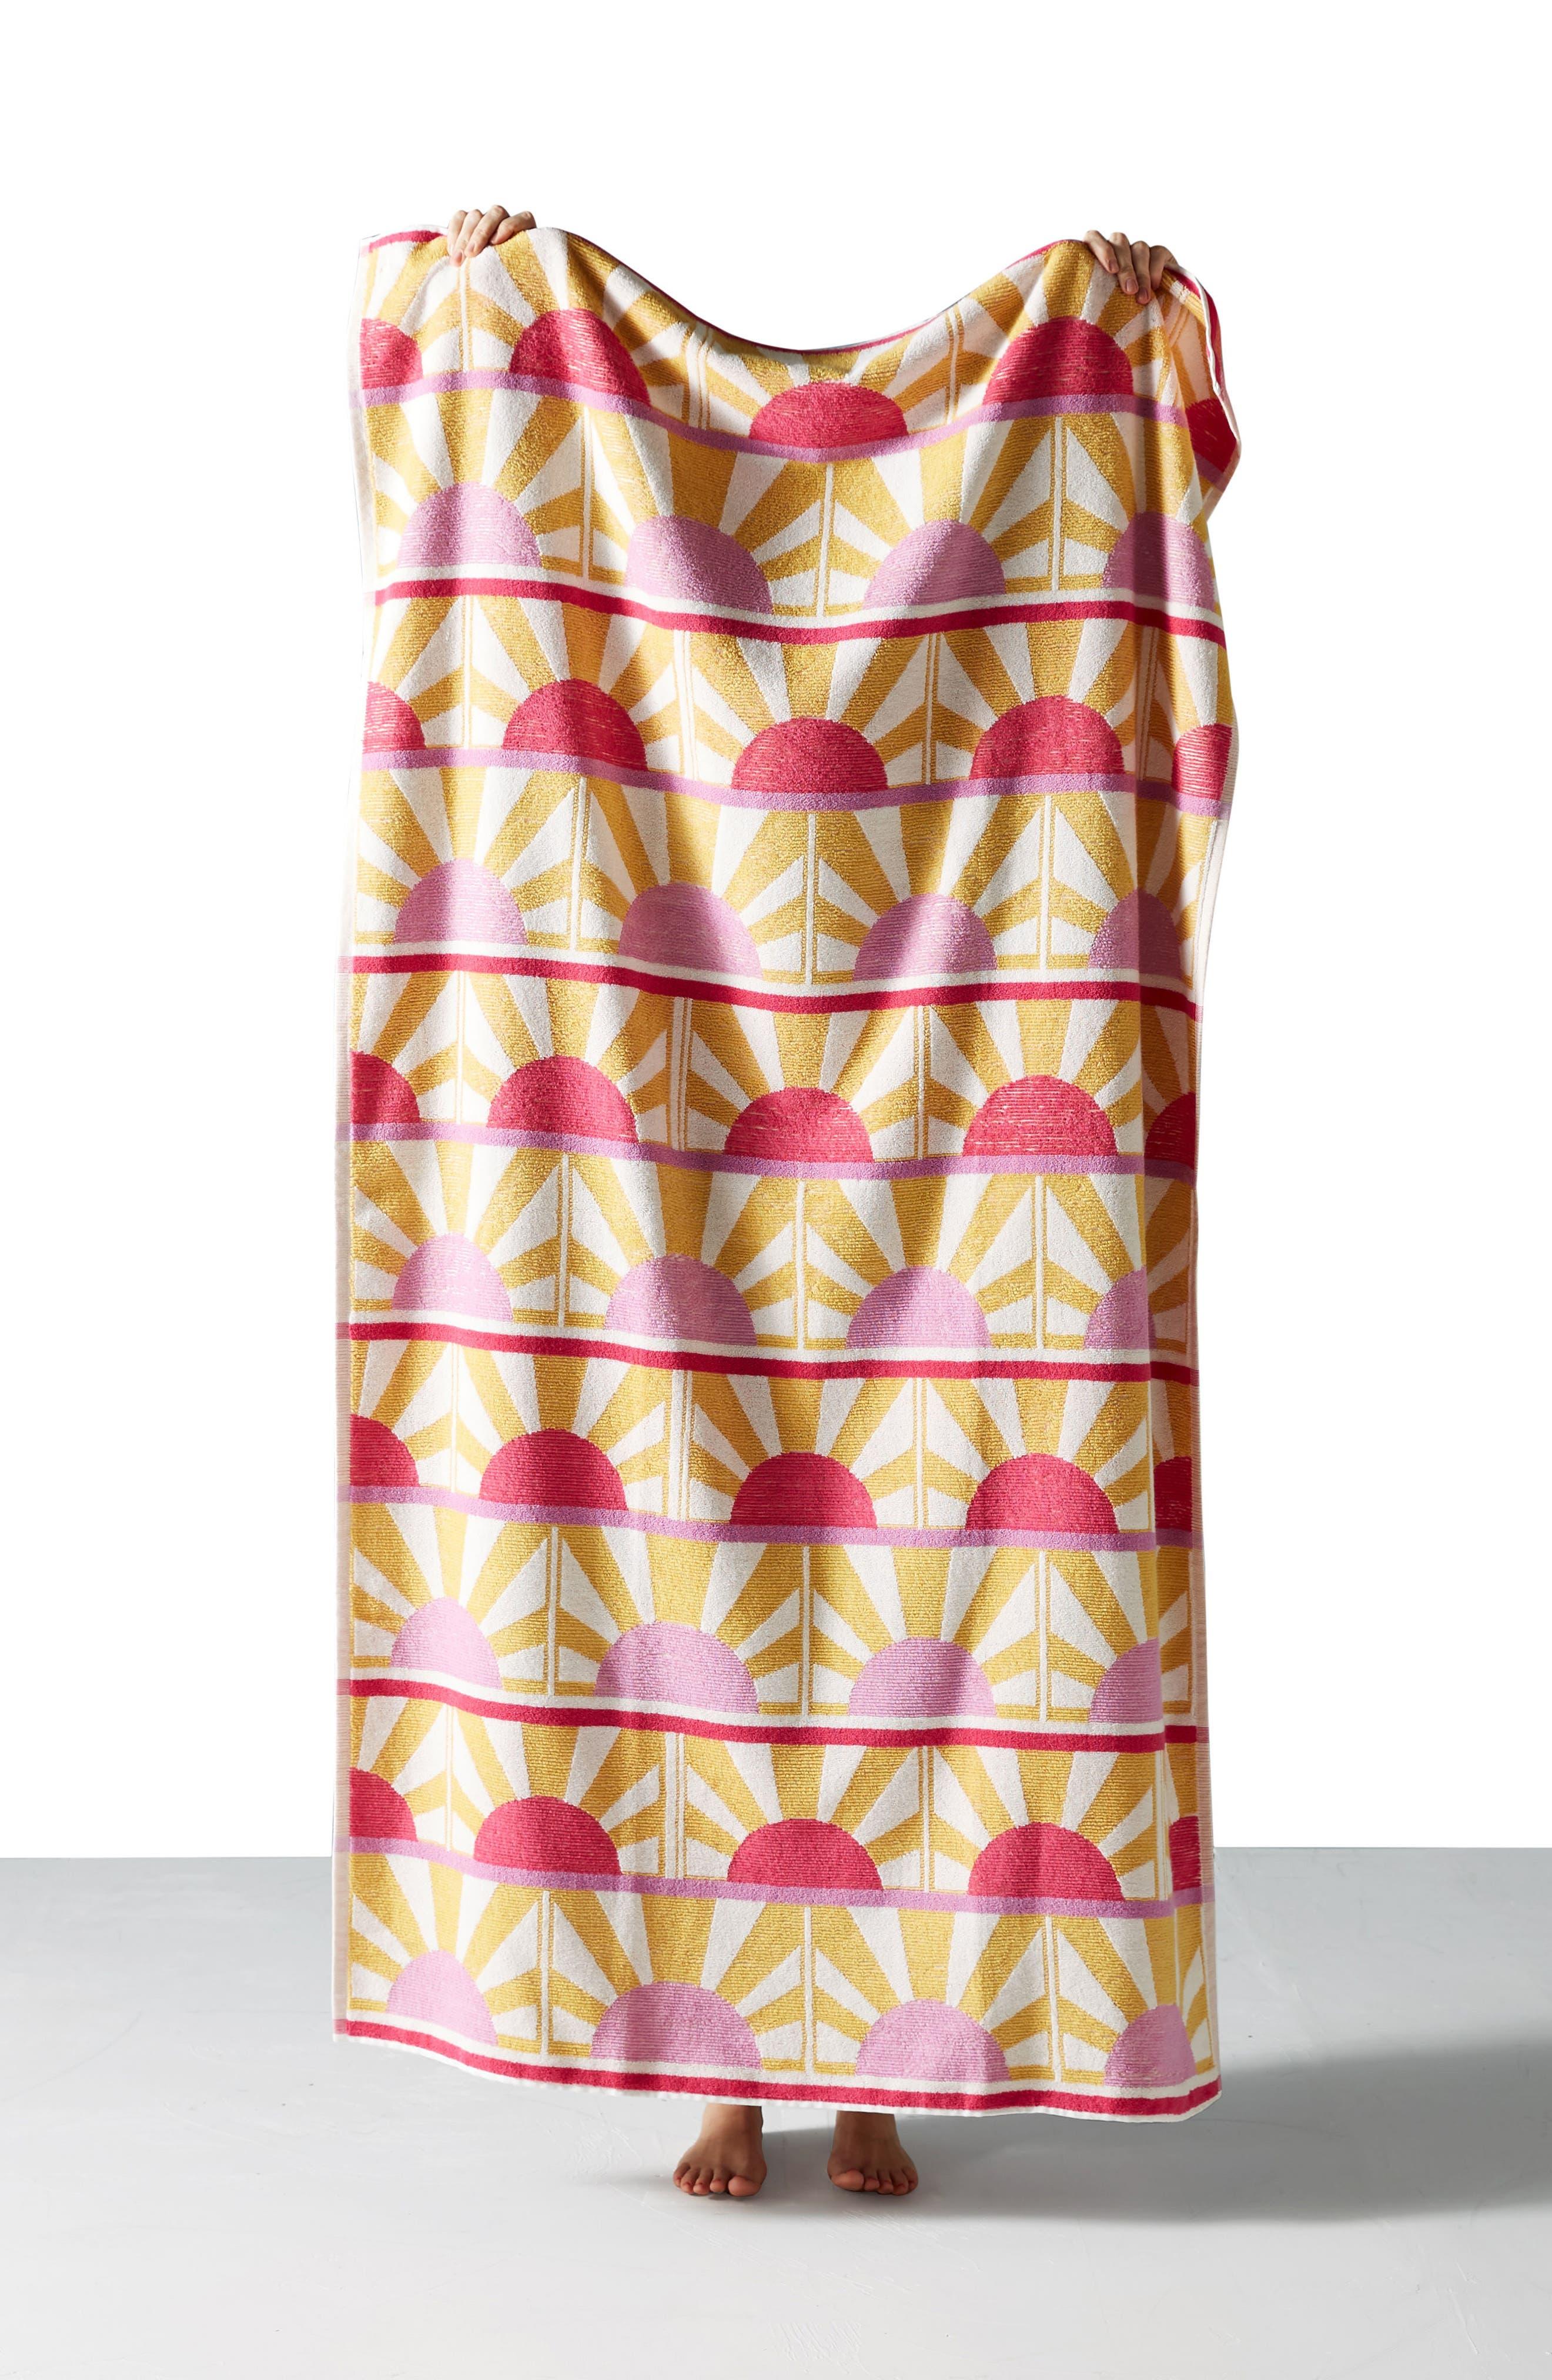 ANTHROPOLOGIE,                             Sun Star Beach Towel,                             Alternate thumbnail 3, color,                             635